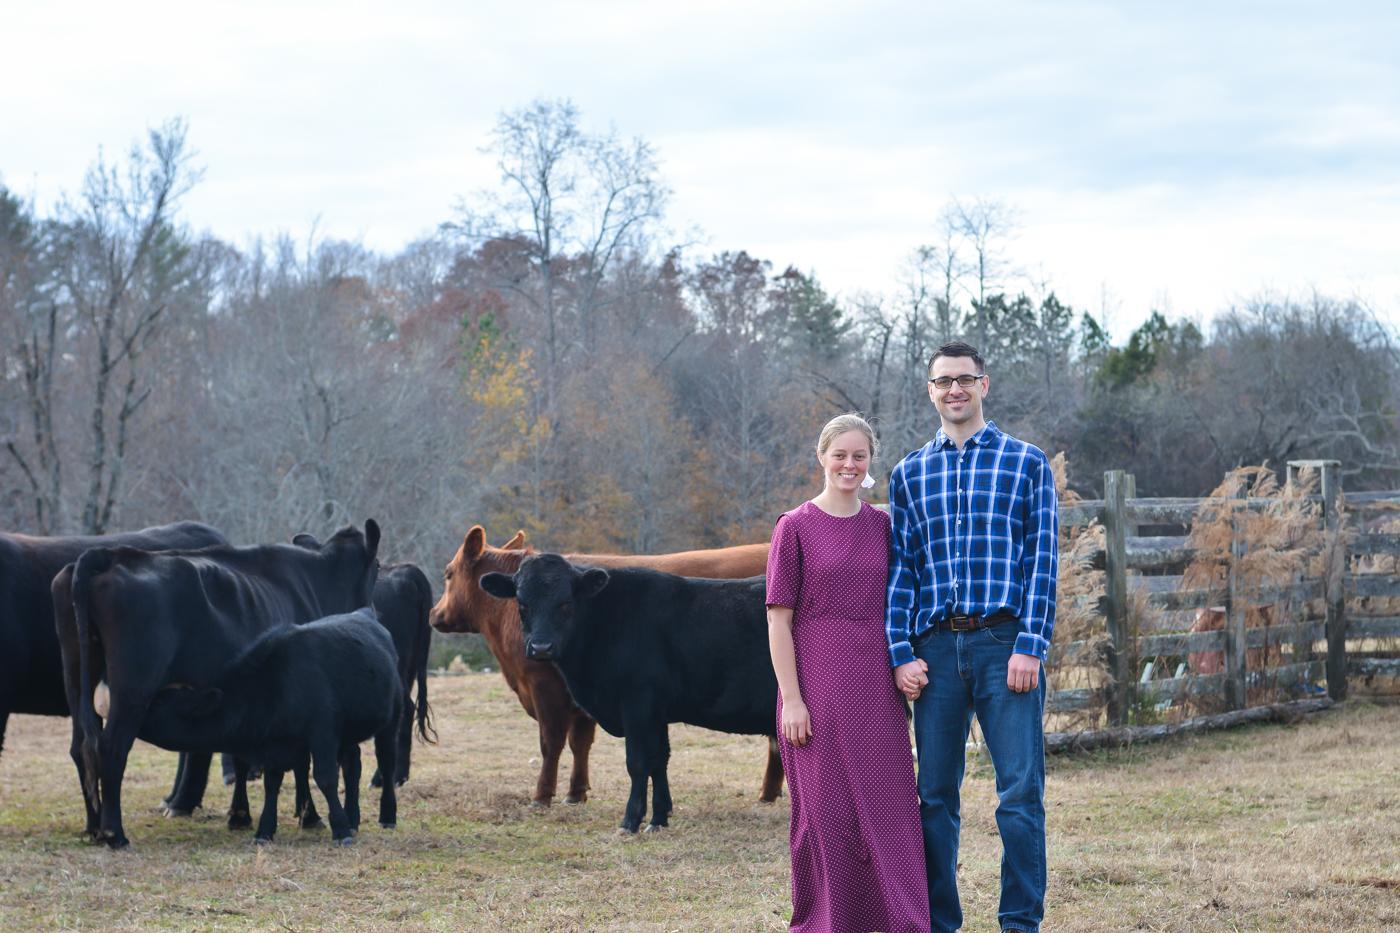 Our Gastroenterology Fellowship Match Story - Briana Thomas